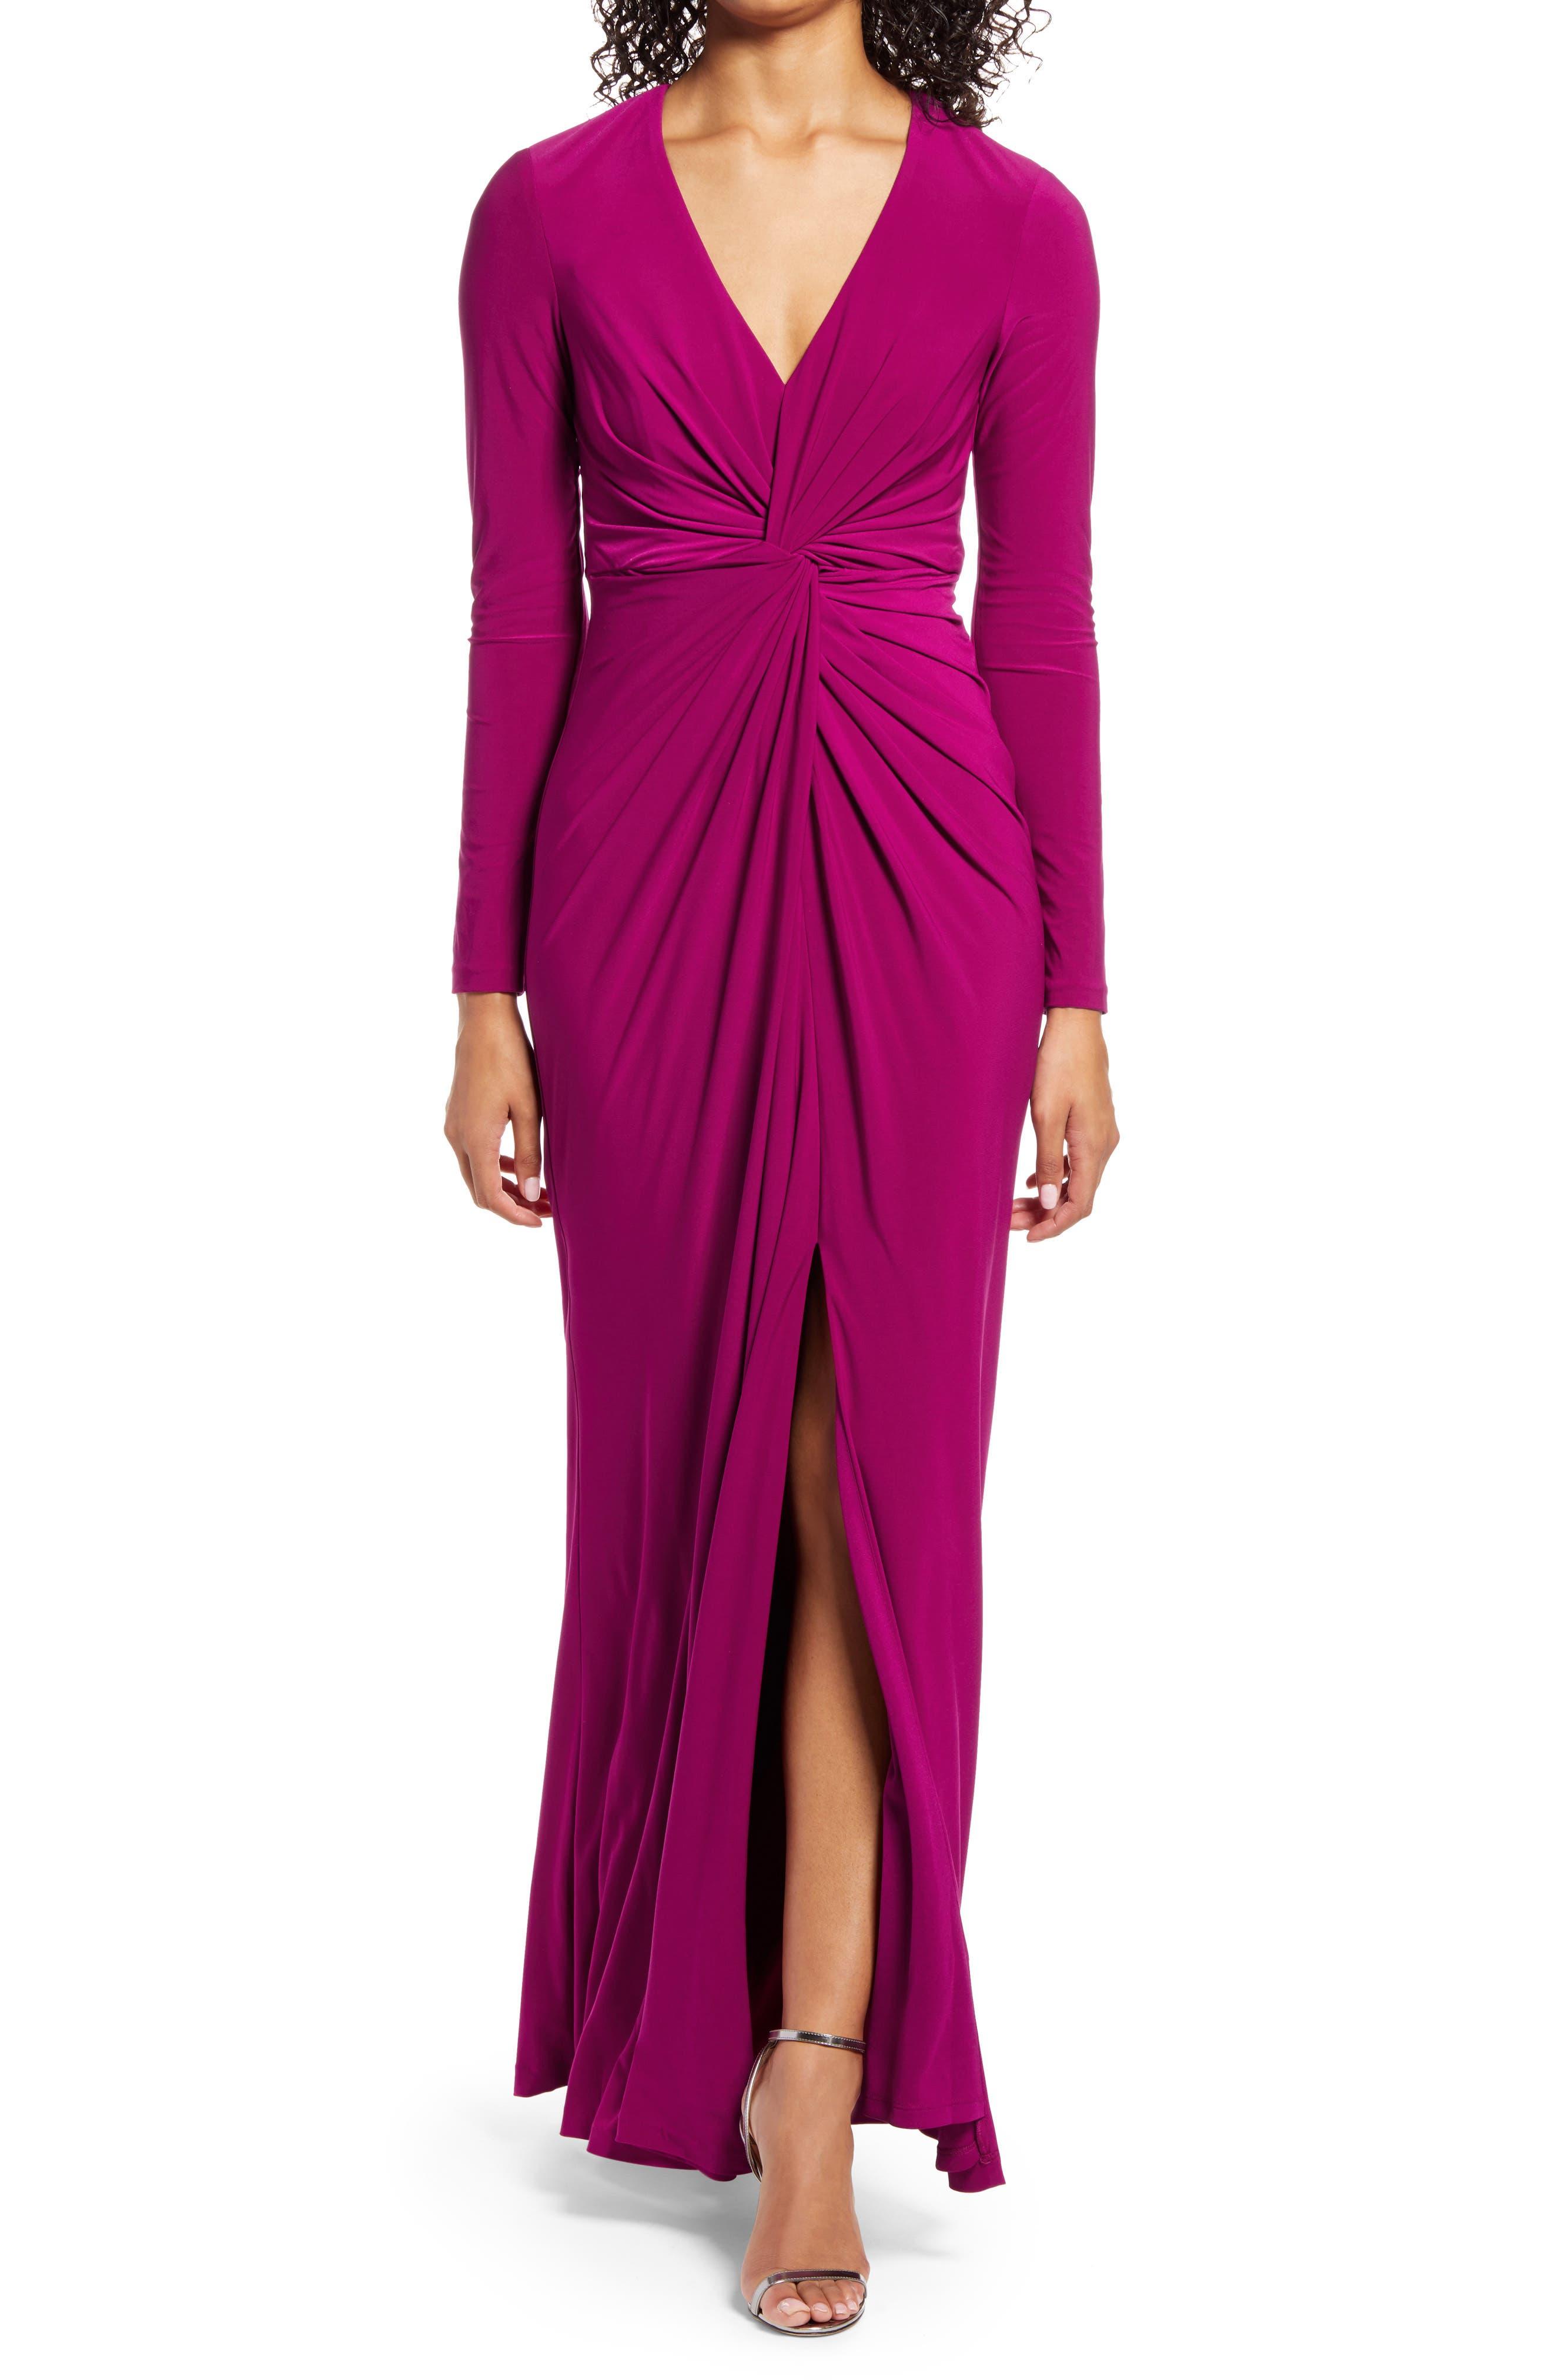 Paisley maxi dress Satin dress Long maxi dress Prom dress with belt